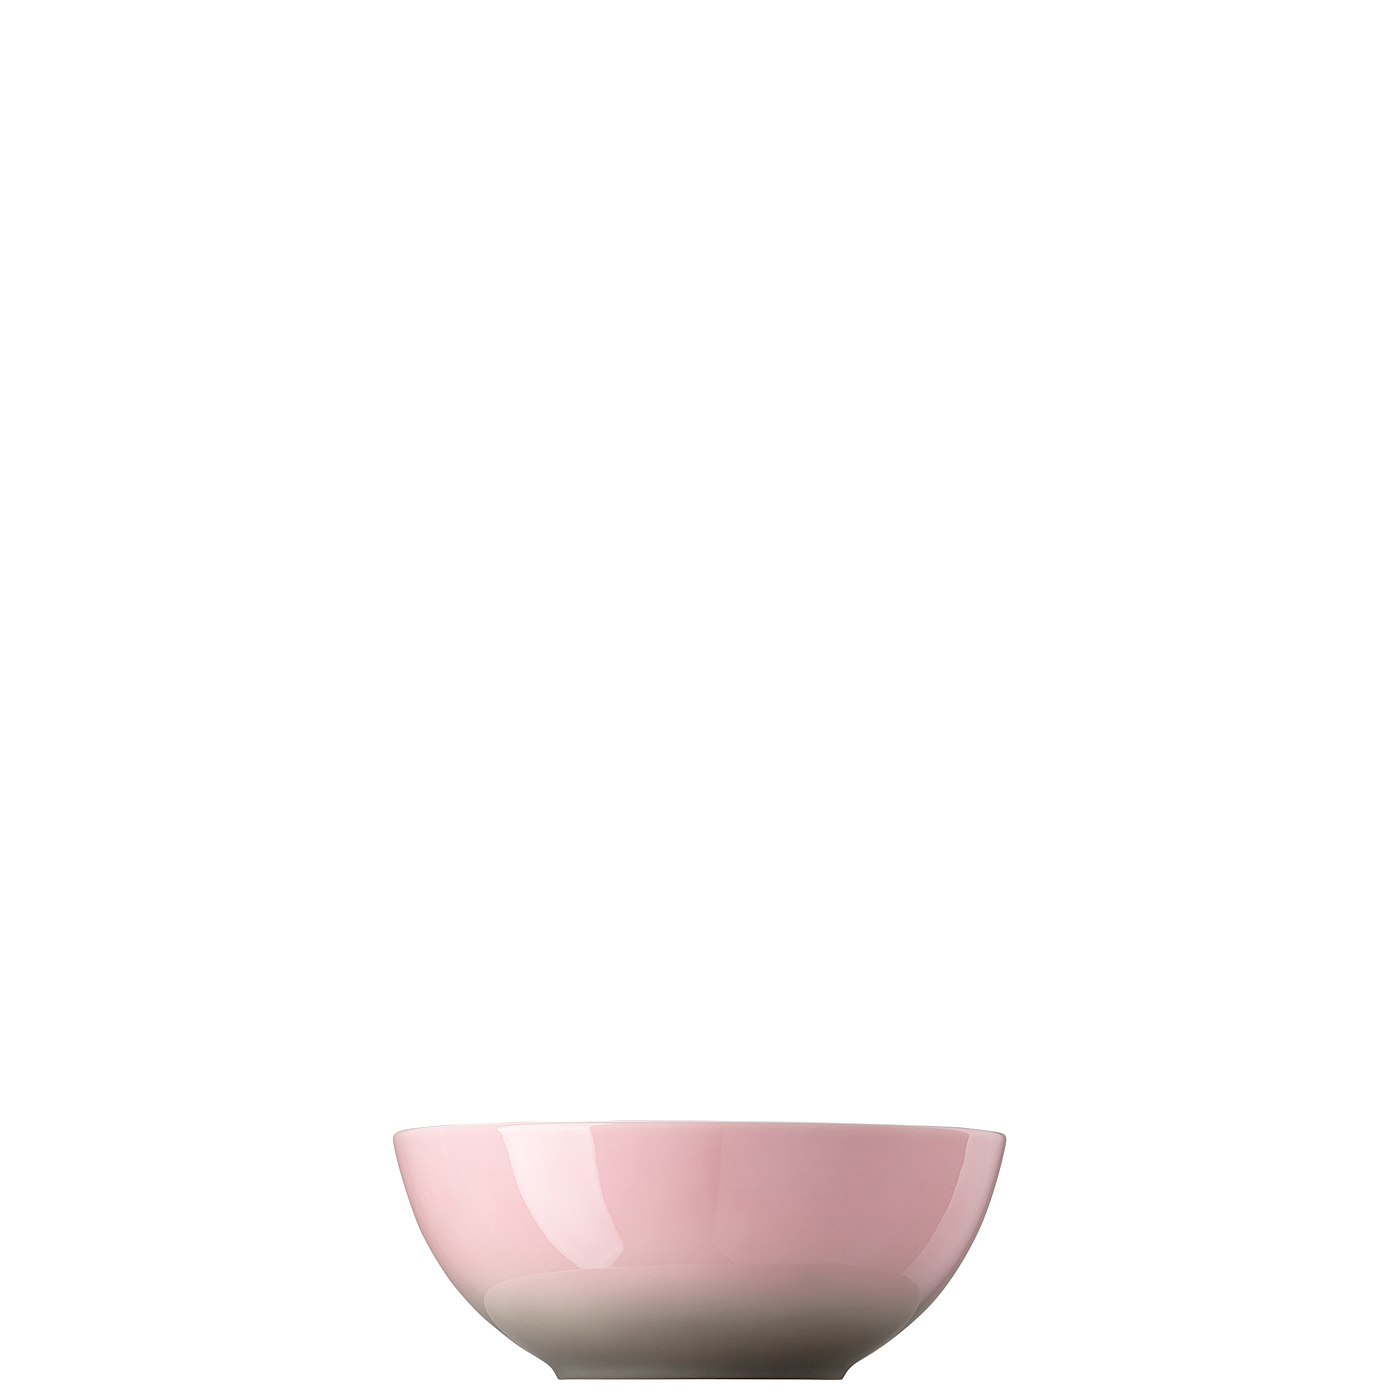 Müslischale 15 cm BeColour Maggy Rose Thomas Porzellan